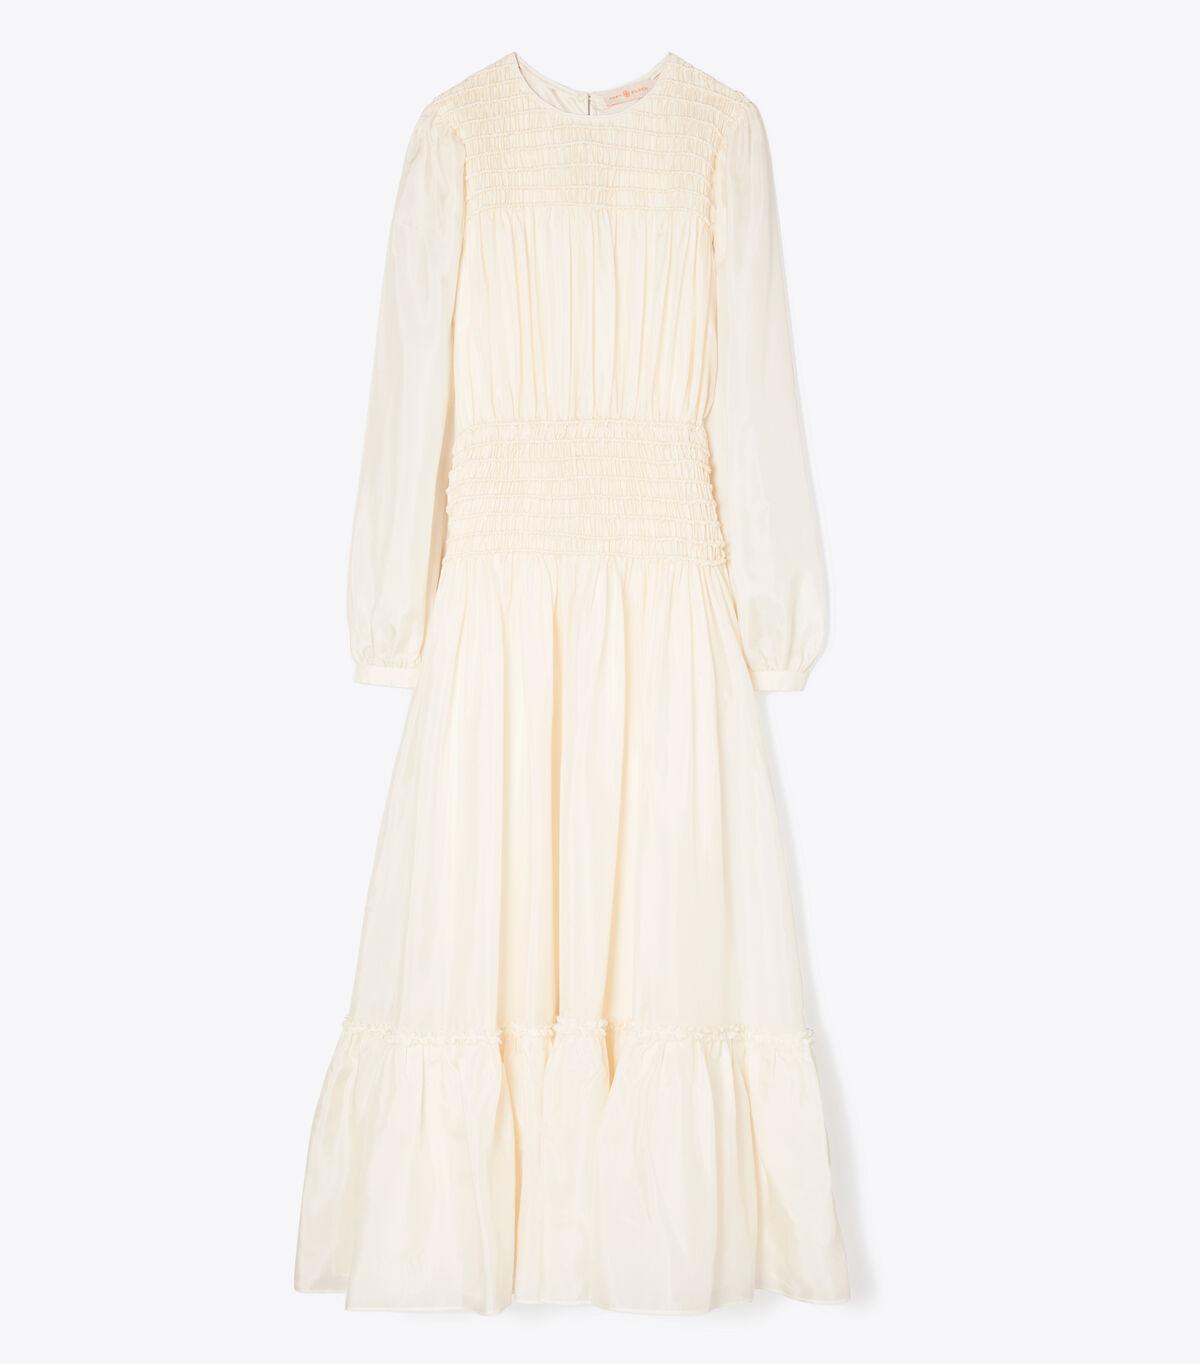 CORDED DRESS